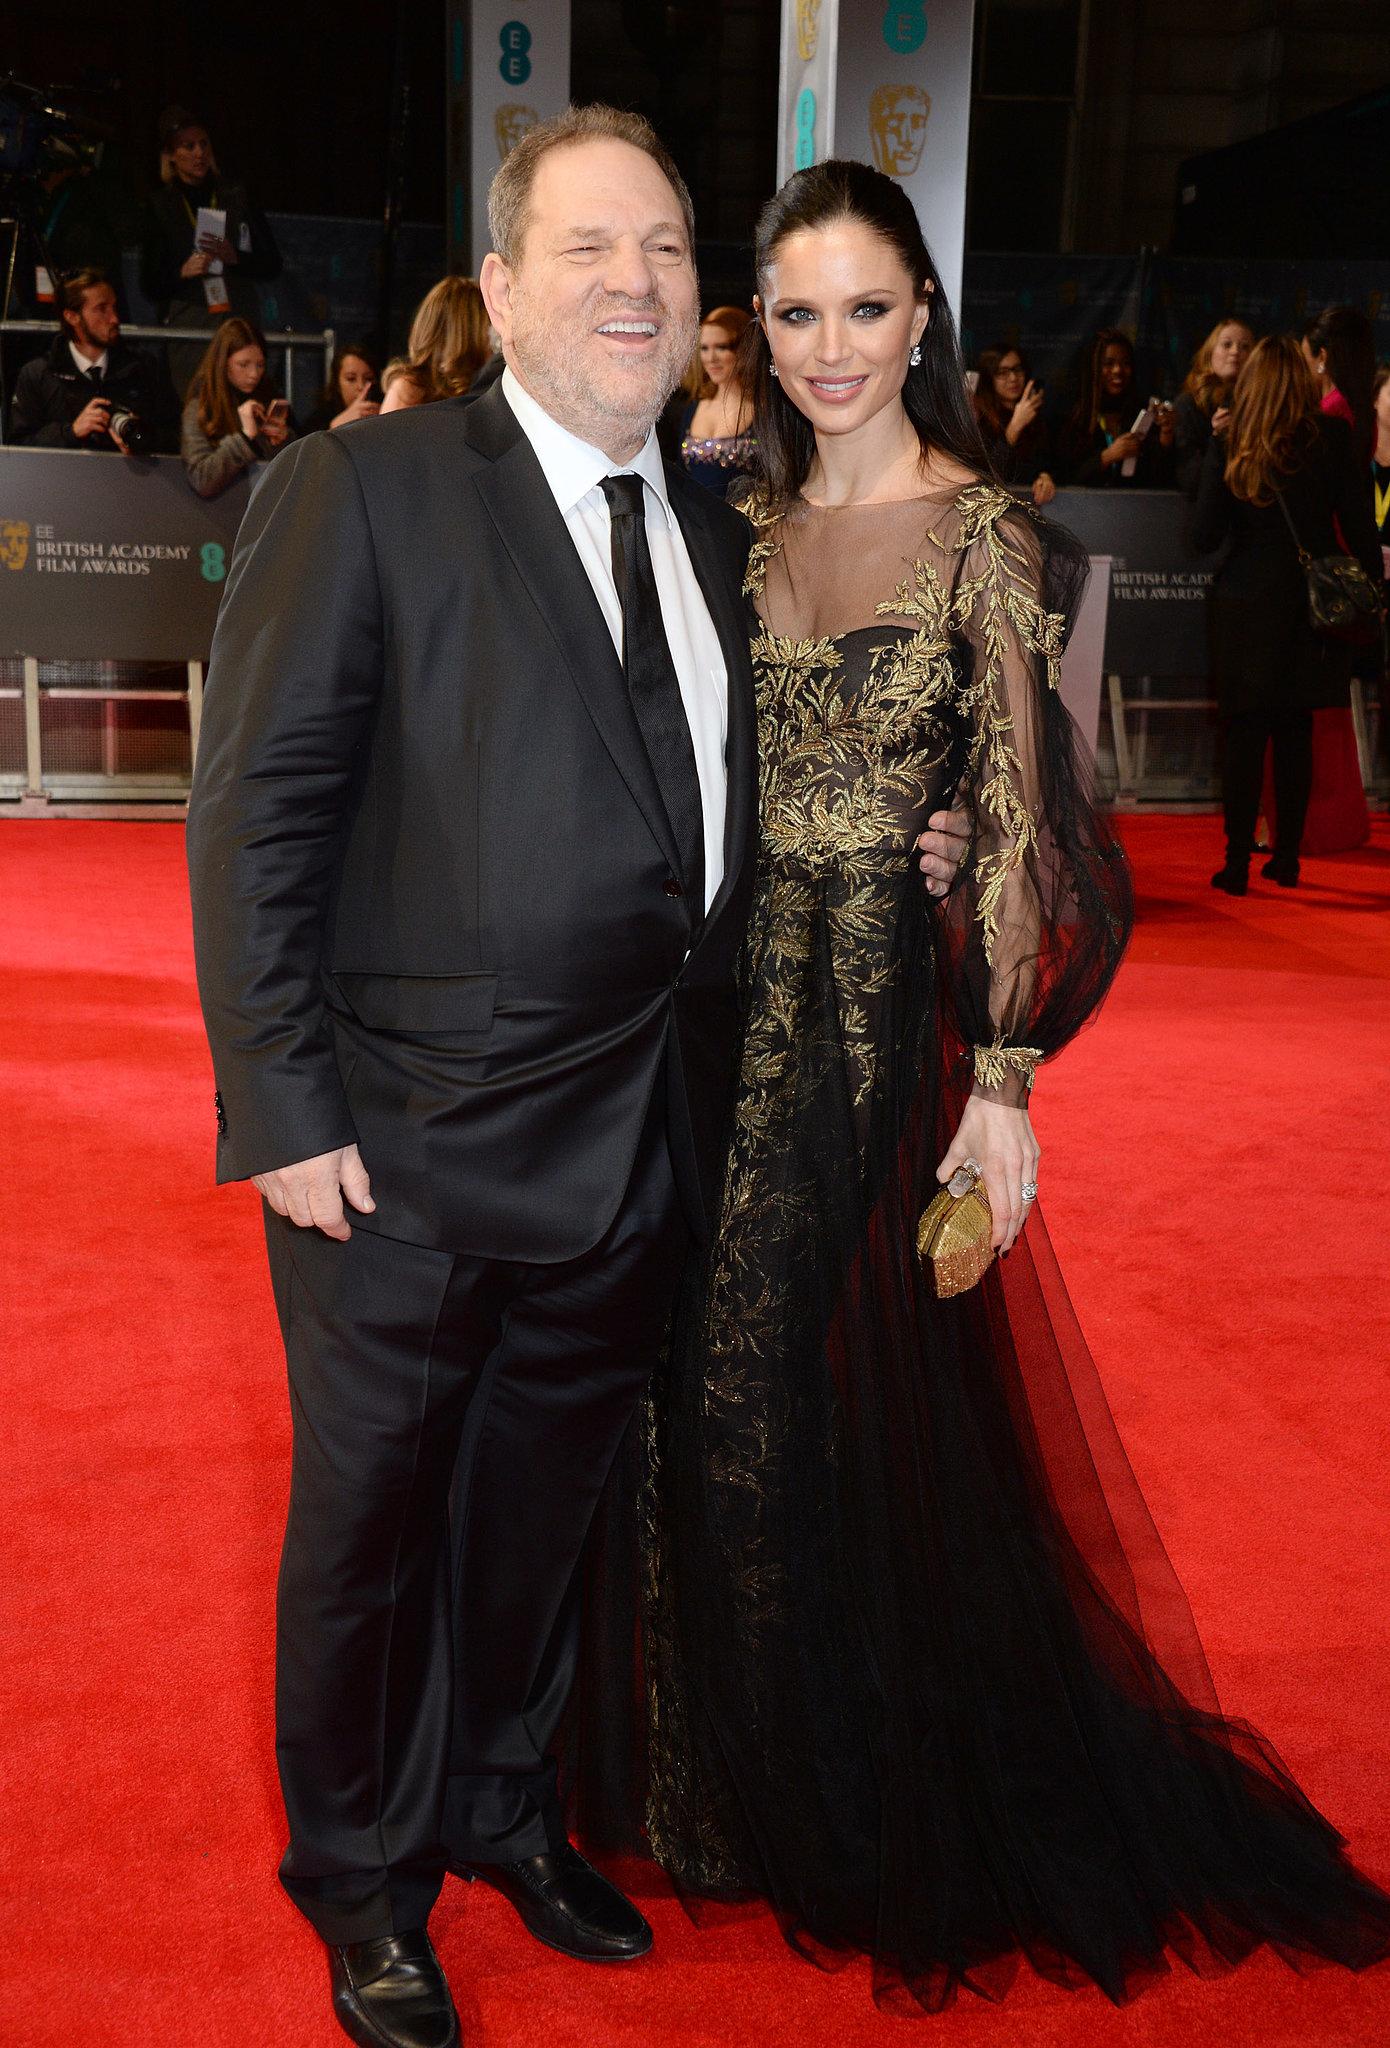 Harvey Weinstein and Georgina Chapman at the 2014 BAFTA Awards.